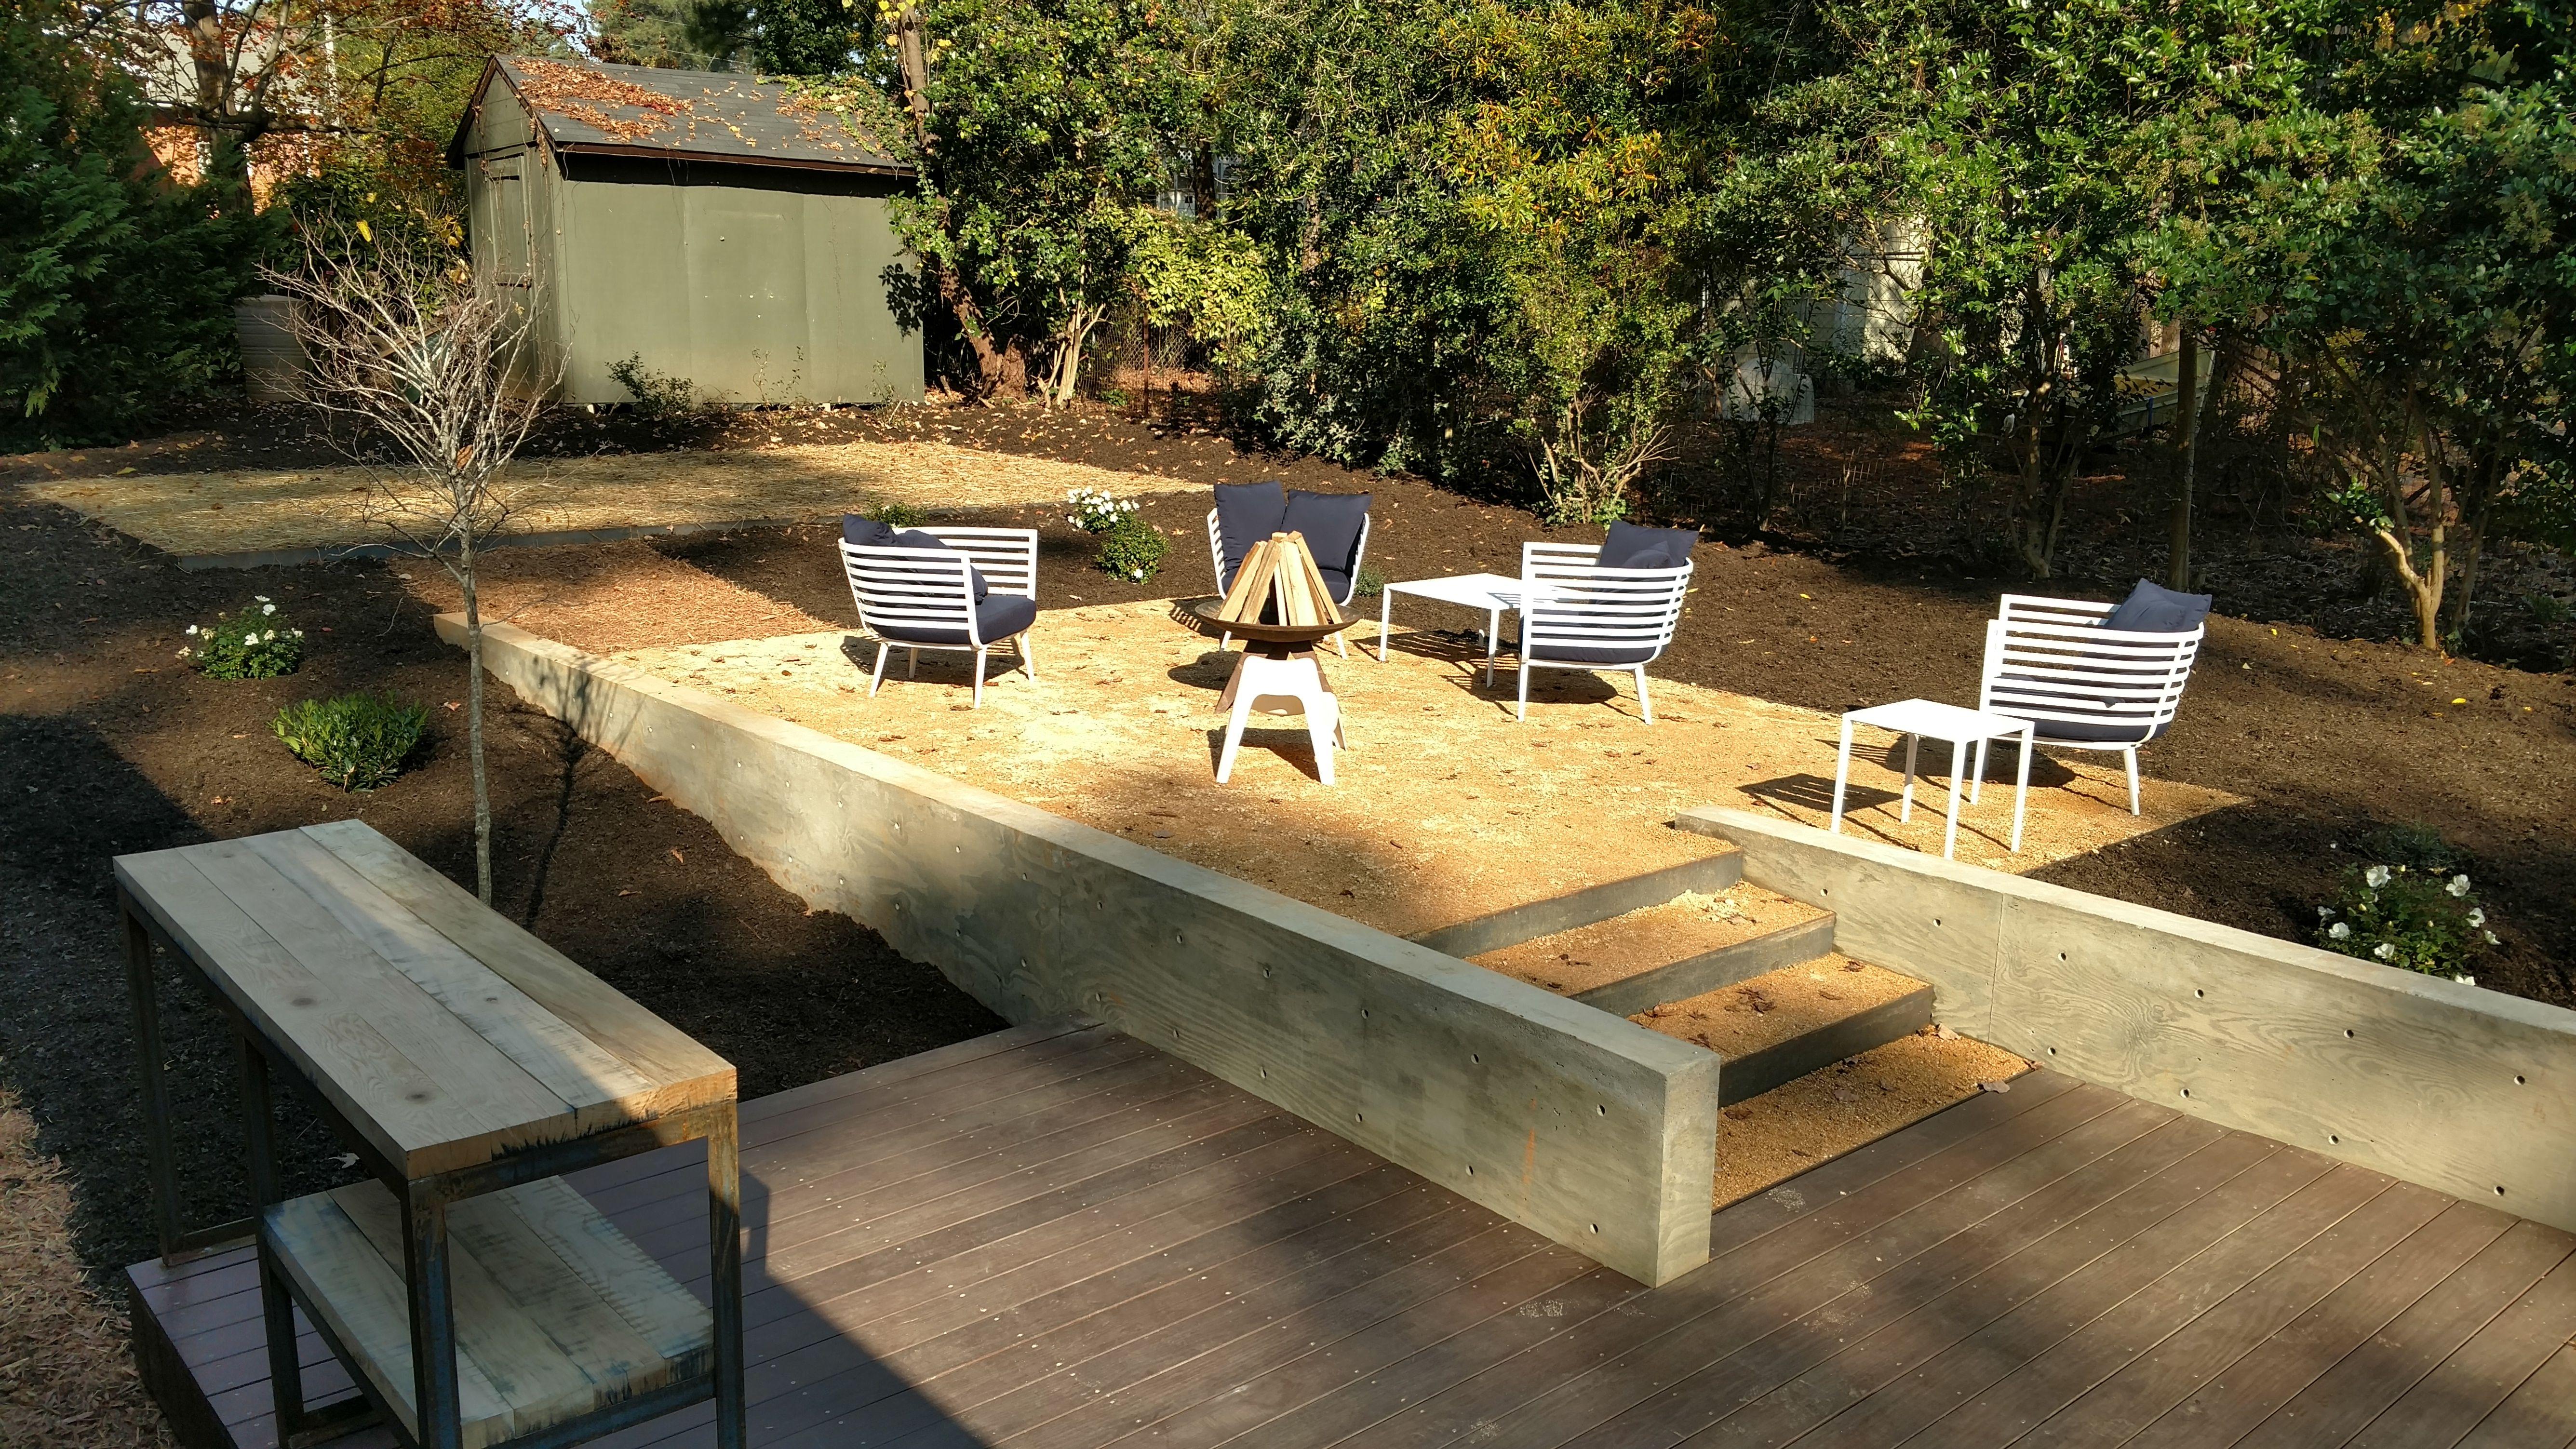 Aedan Workshop Concrete Retaining Wall Patio Deck Furniture Patio Concrete Retaining Walls Outdoor Furniture Sets